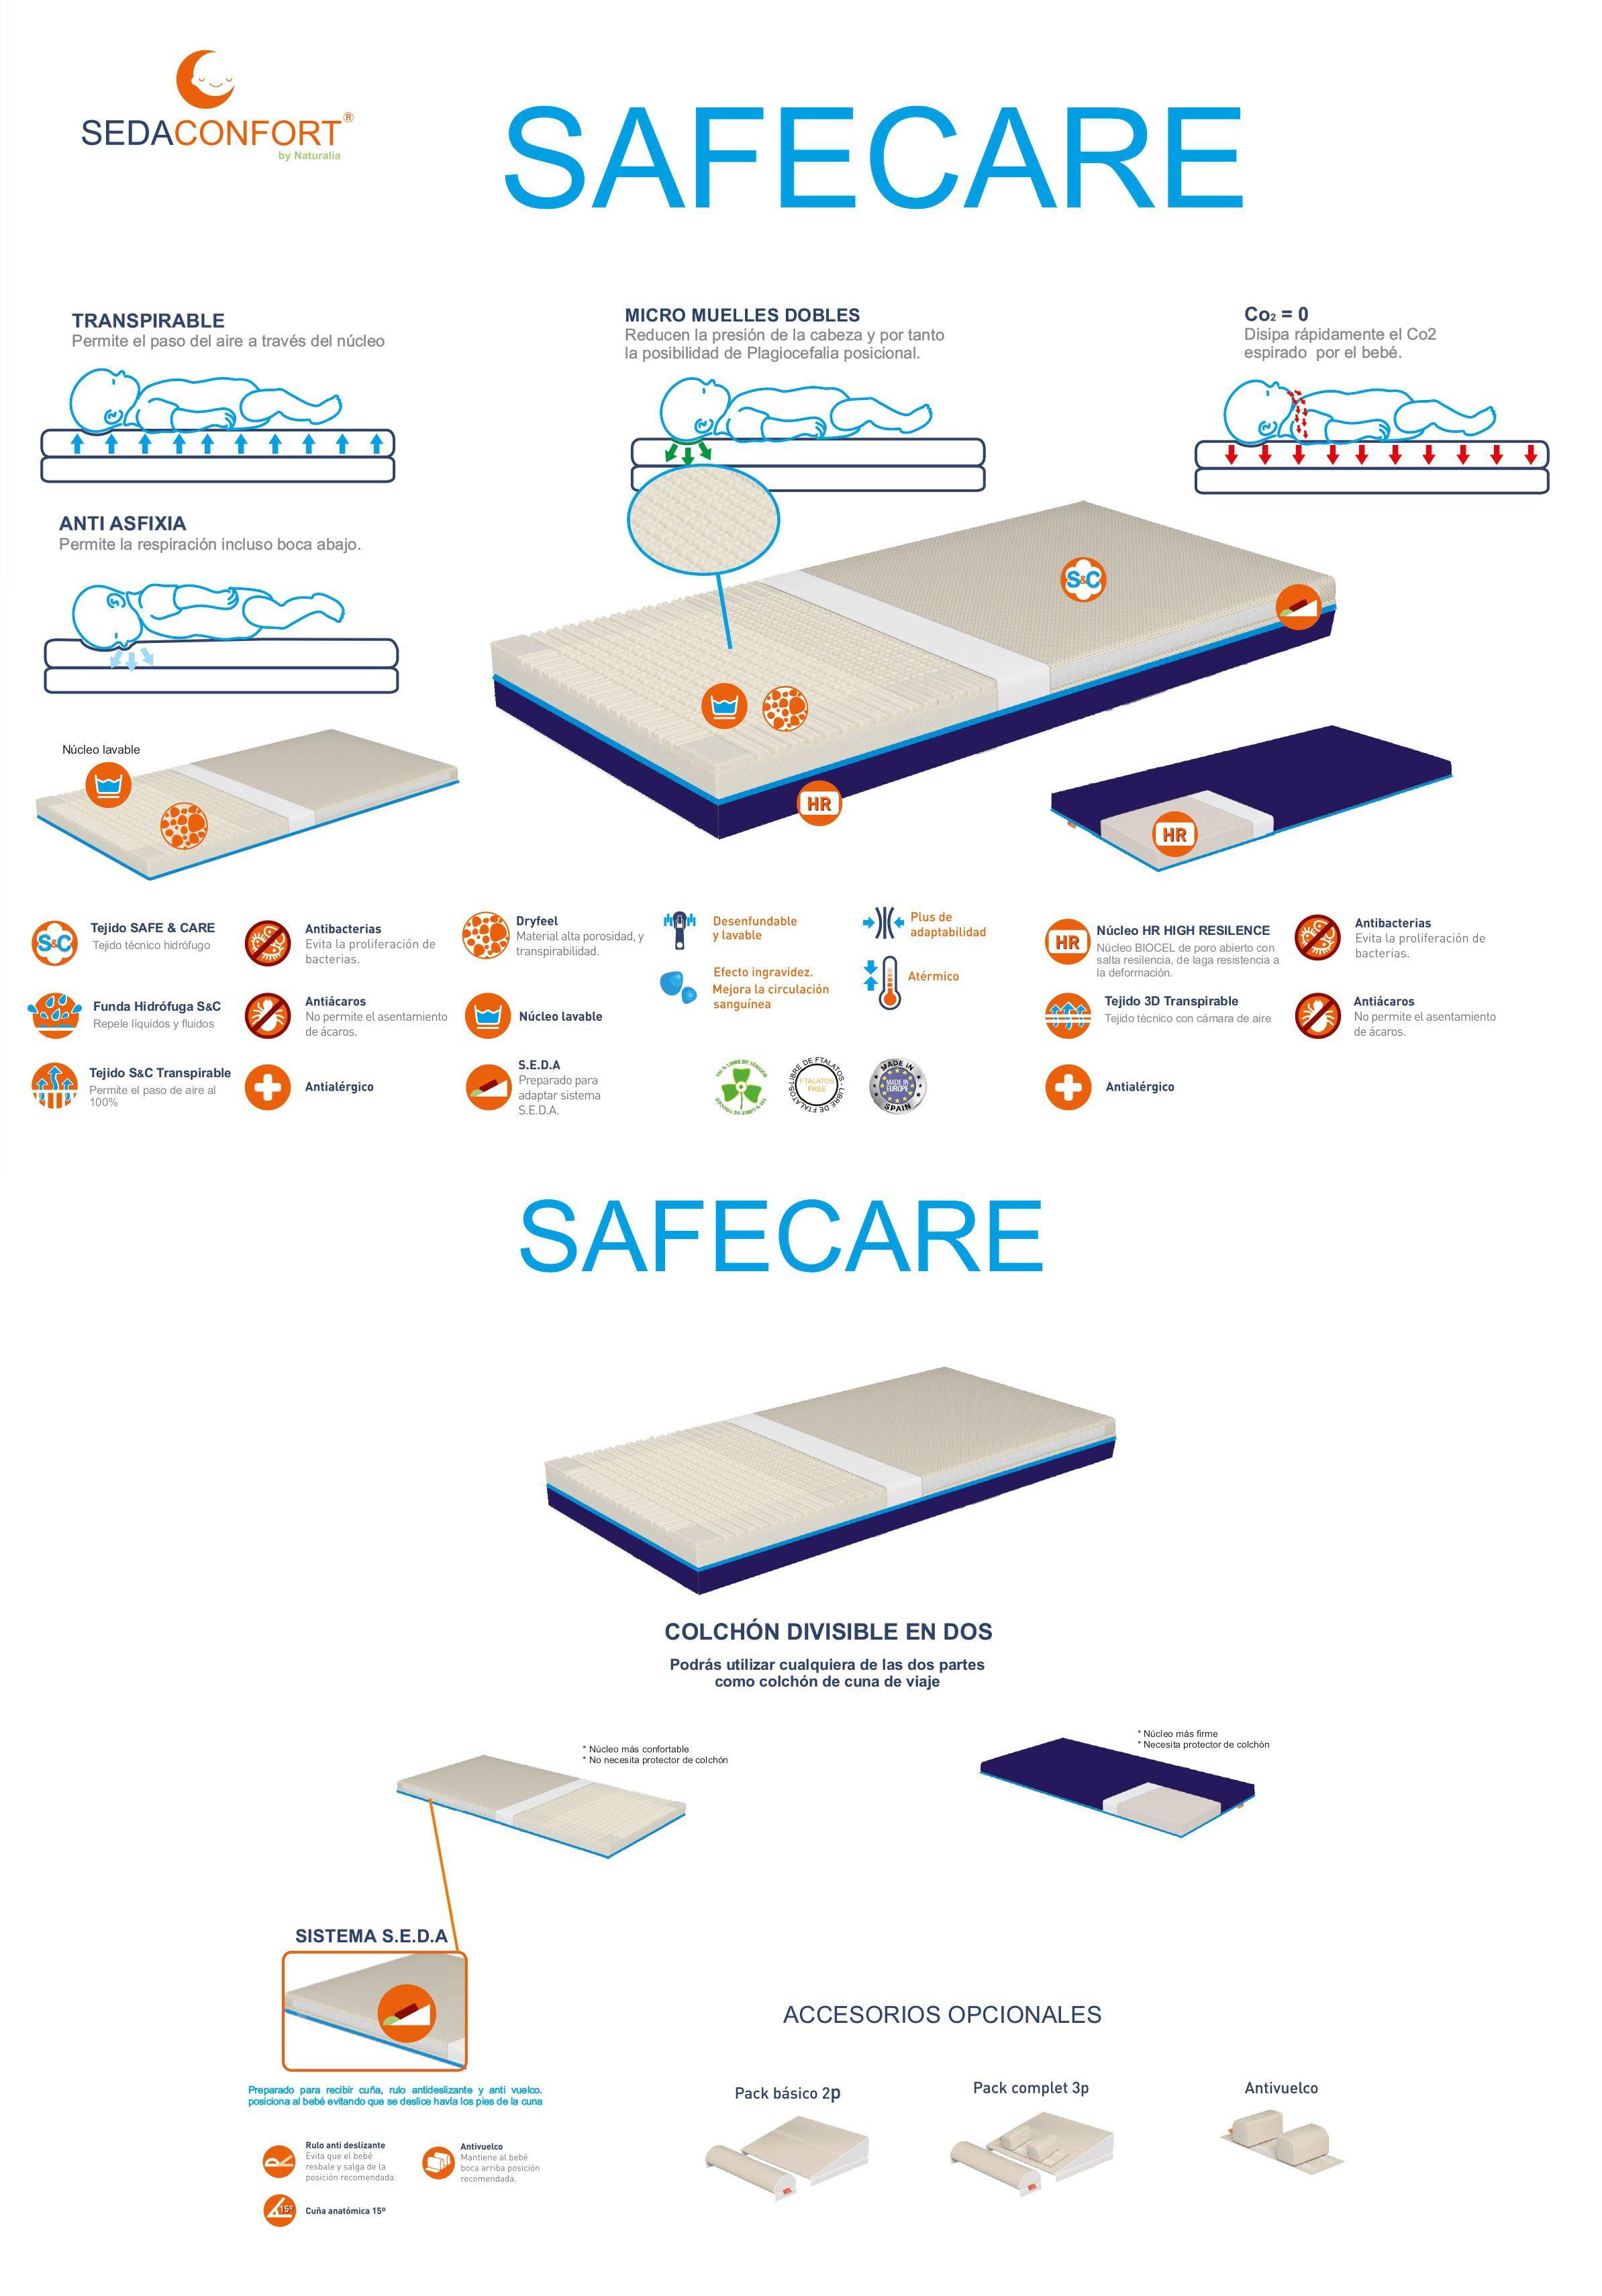 Colchones Safecare